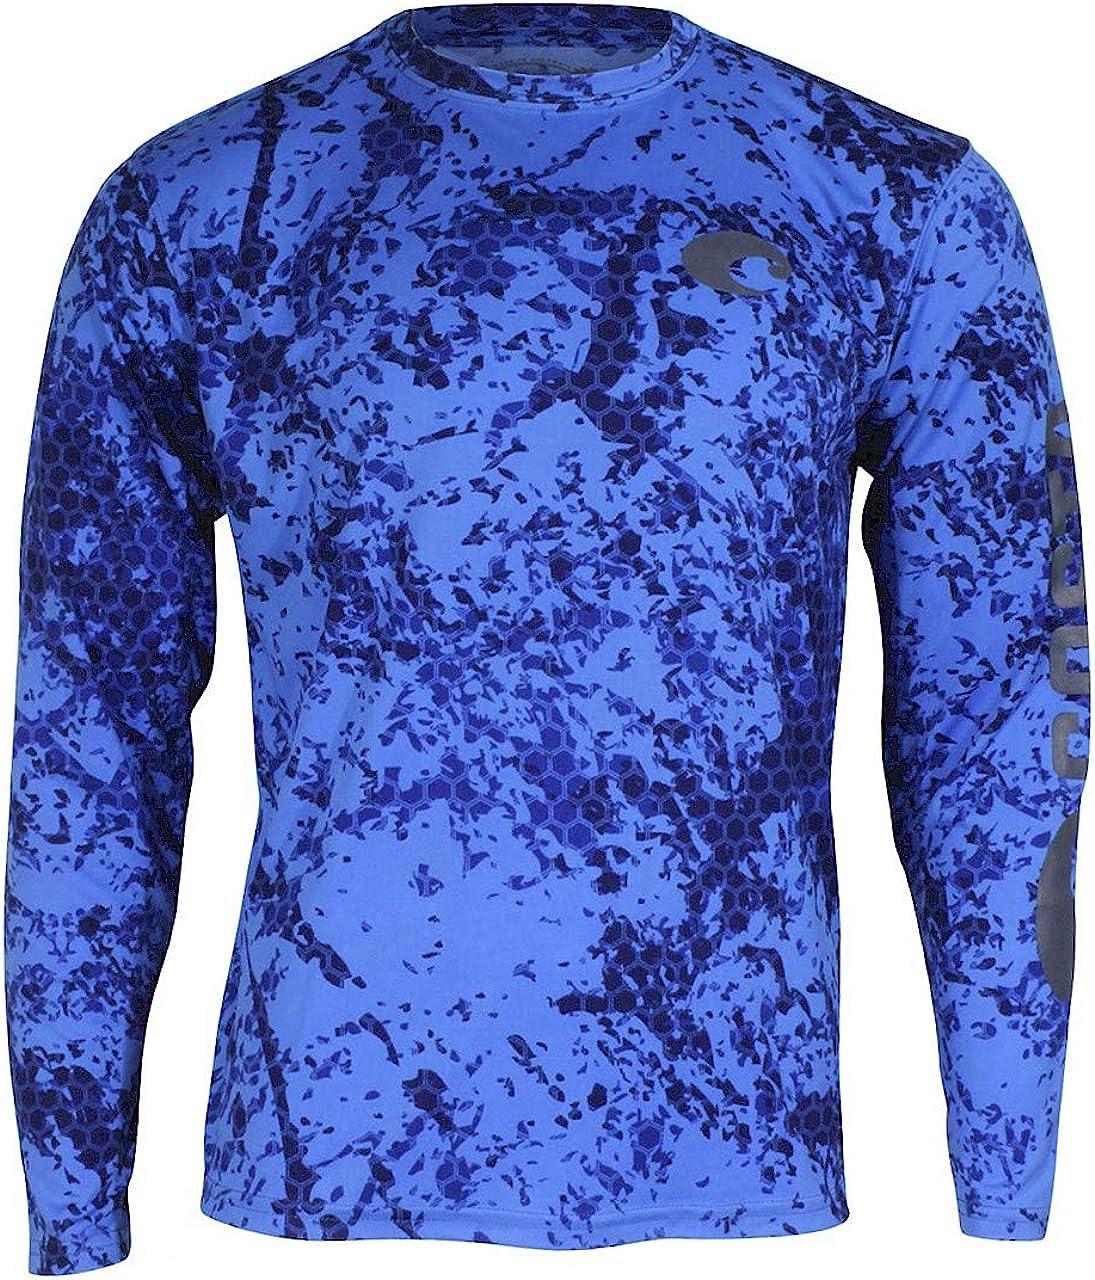 Costa Del Mar Hexo Technical Long Sleeve Shirt